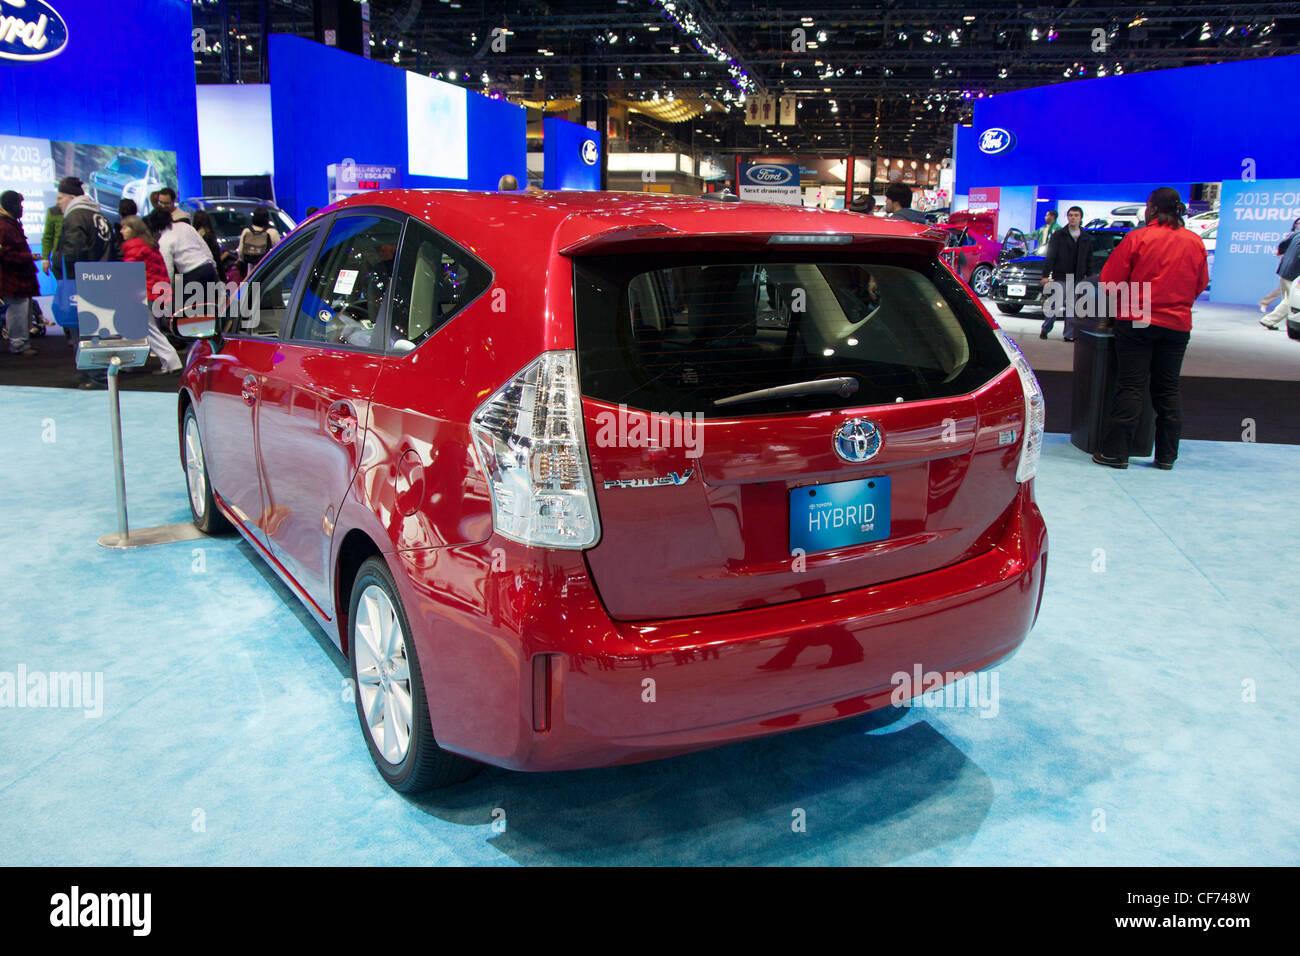 Toyota Prius V. 2012 Chicago Auto Show. - Stock Image